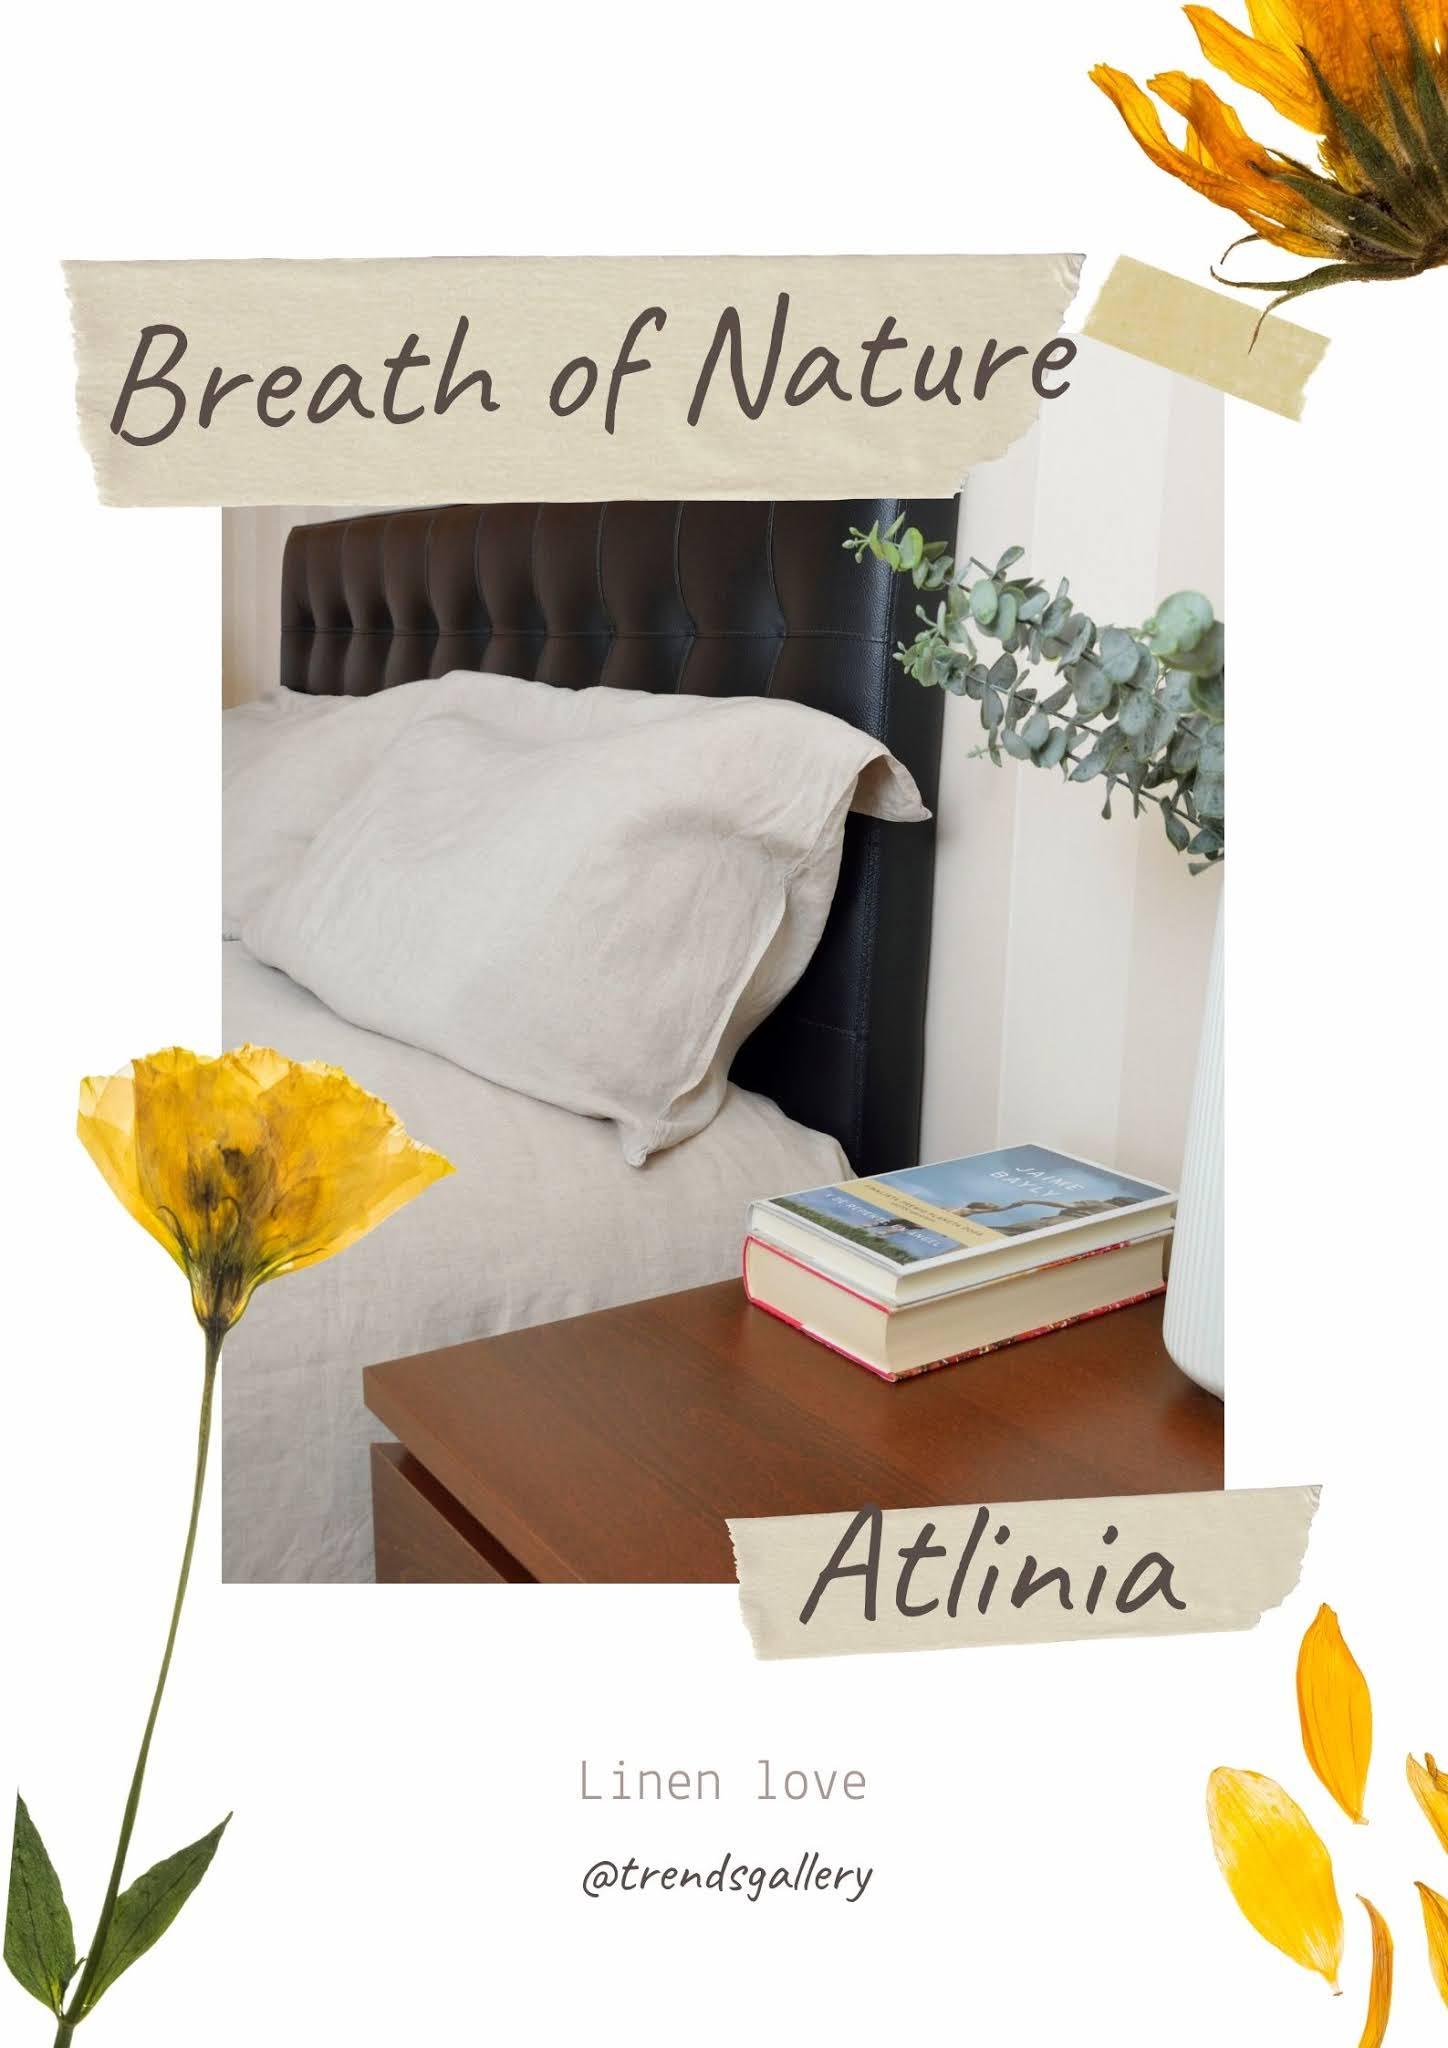 atlinia_Breath_of_Nature_duvet_cover_cubierta_lino_funda_nordica_ropa_de_cama